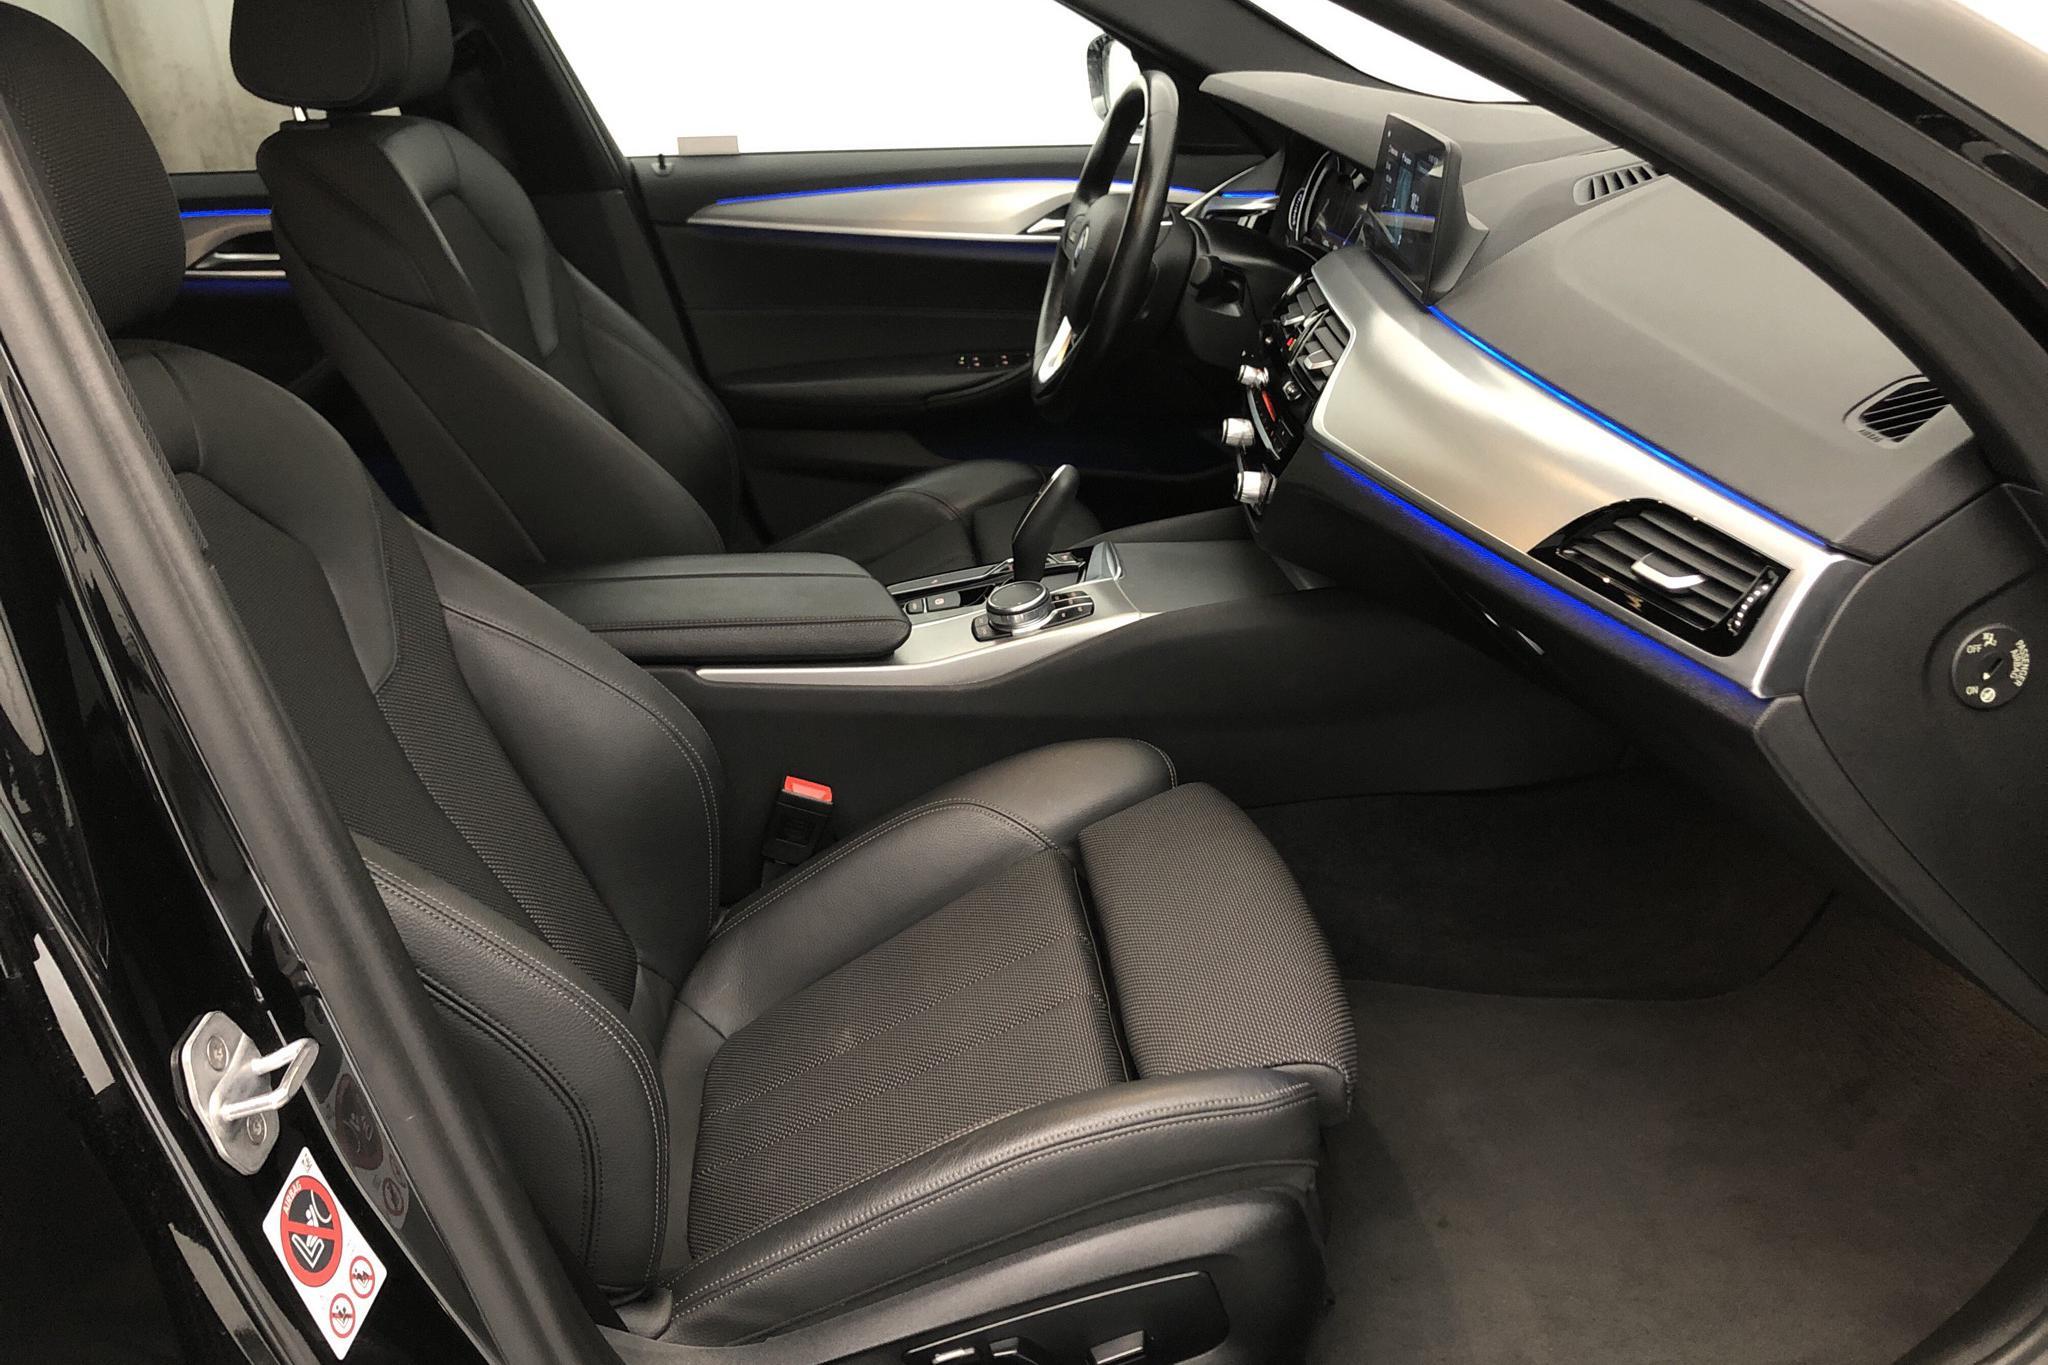 BMW 520d xDrive Sedan, G30 (190hk) - 4 578 mil - Automat - svart - 2017